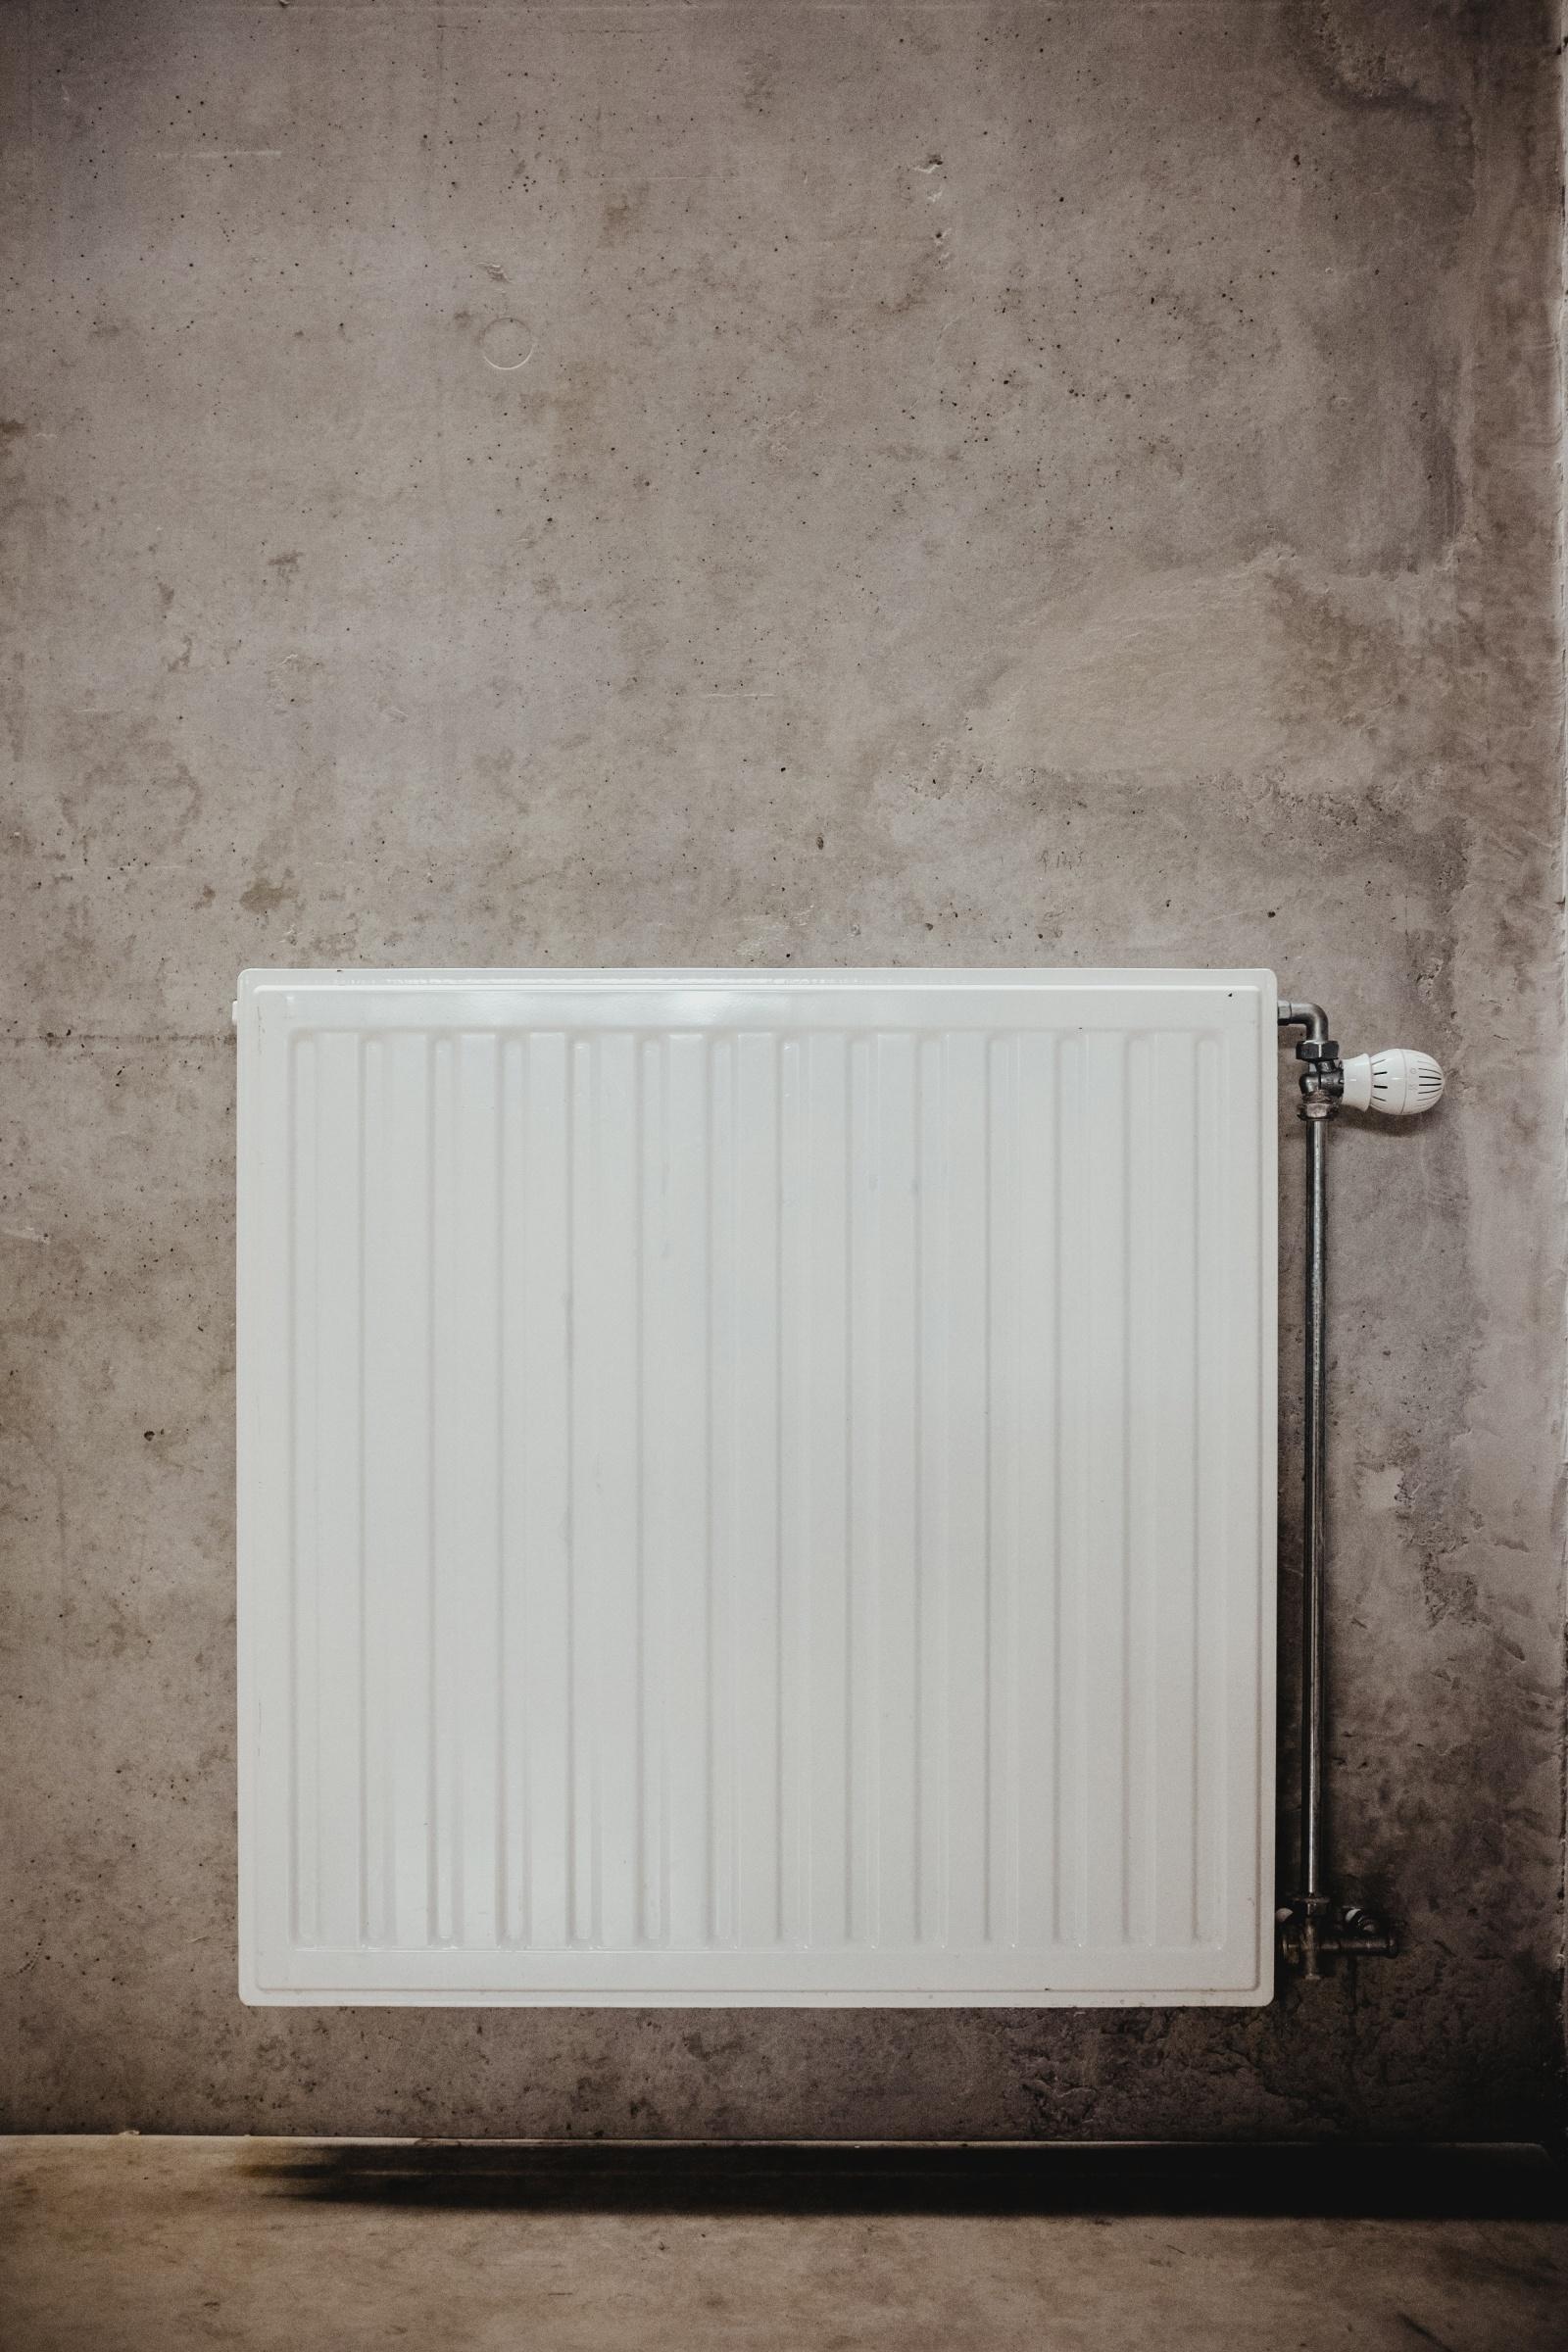 Pipe, tank and radiator insulation